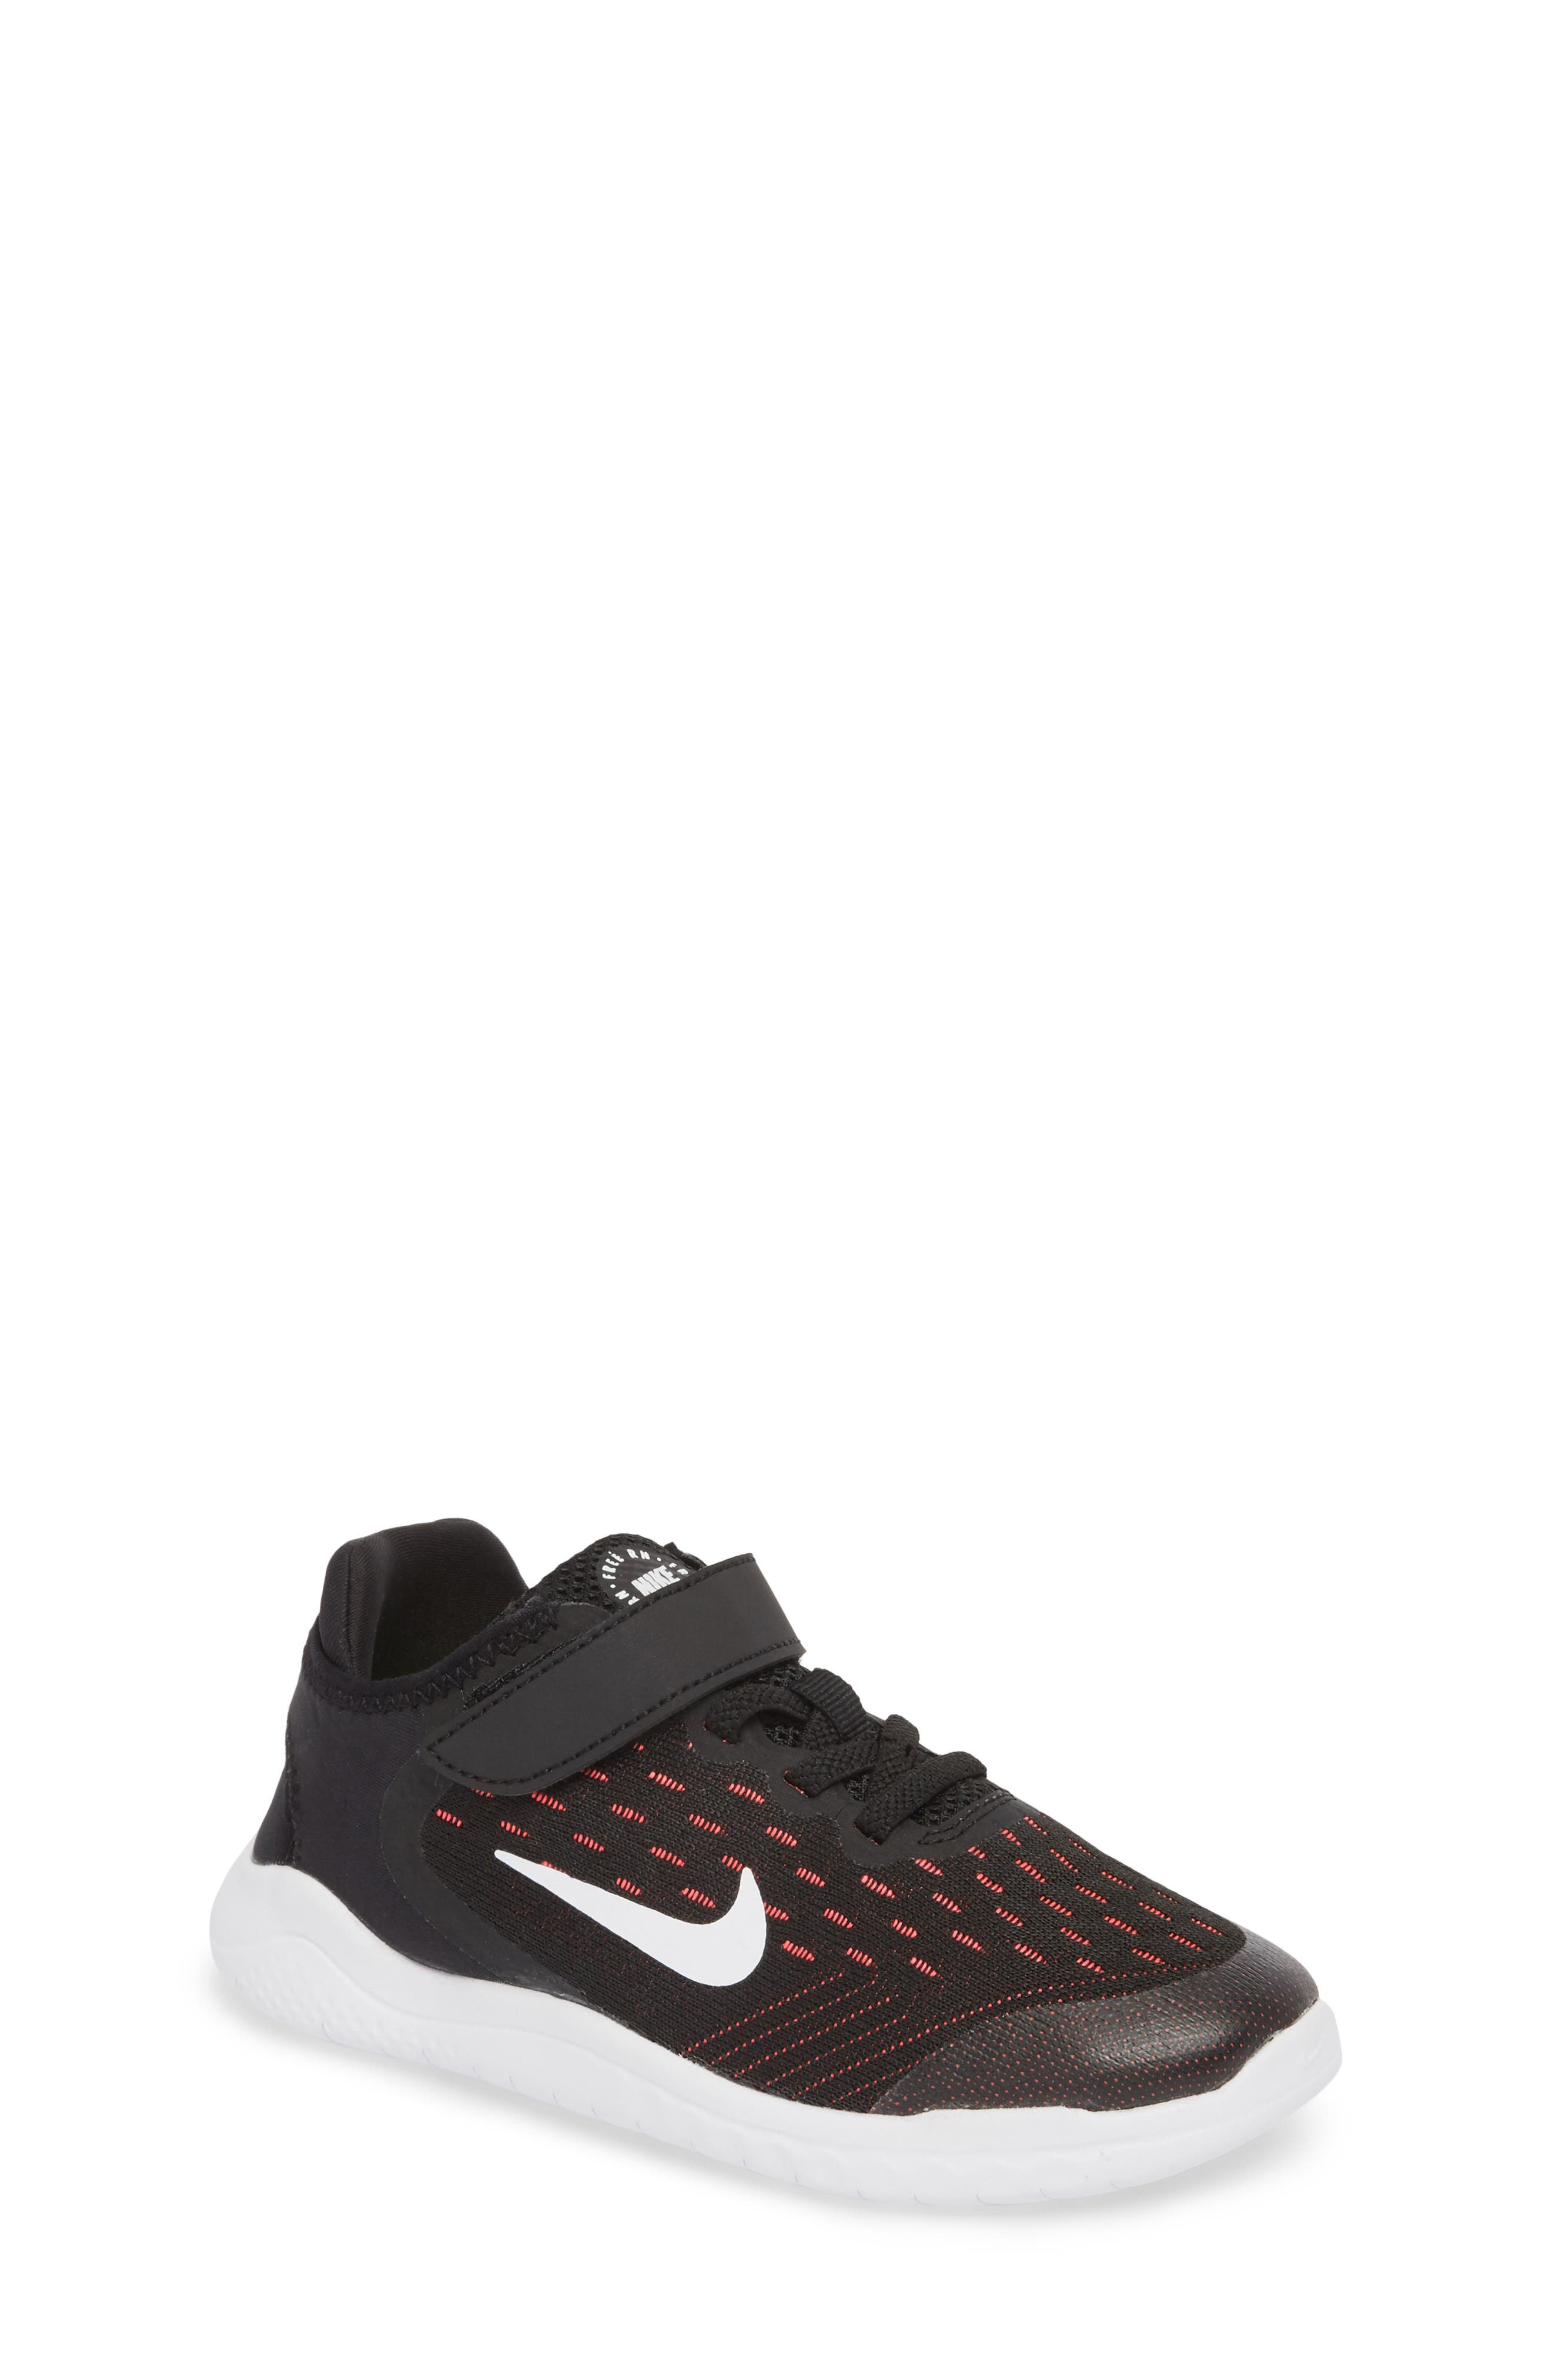 Free RN Running Shoe,                         Main,                         color, Black/ White/ Pink/ Volt